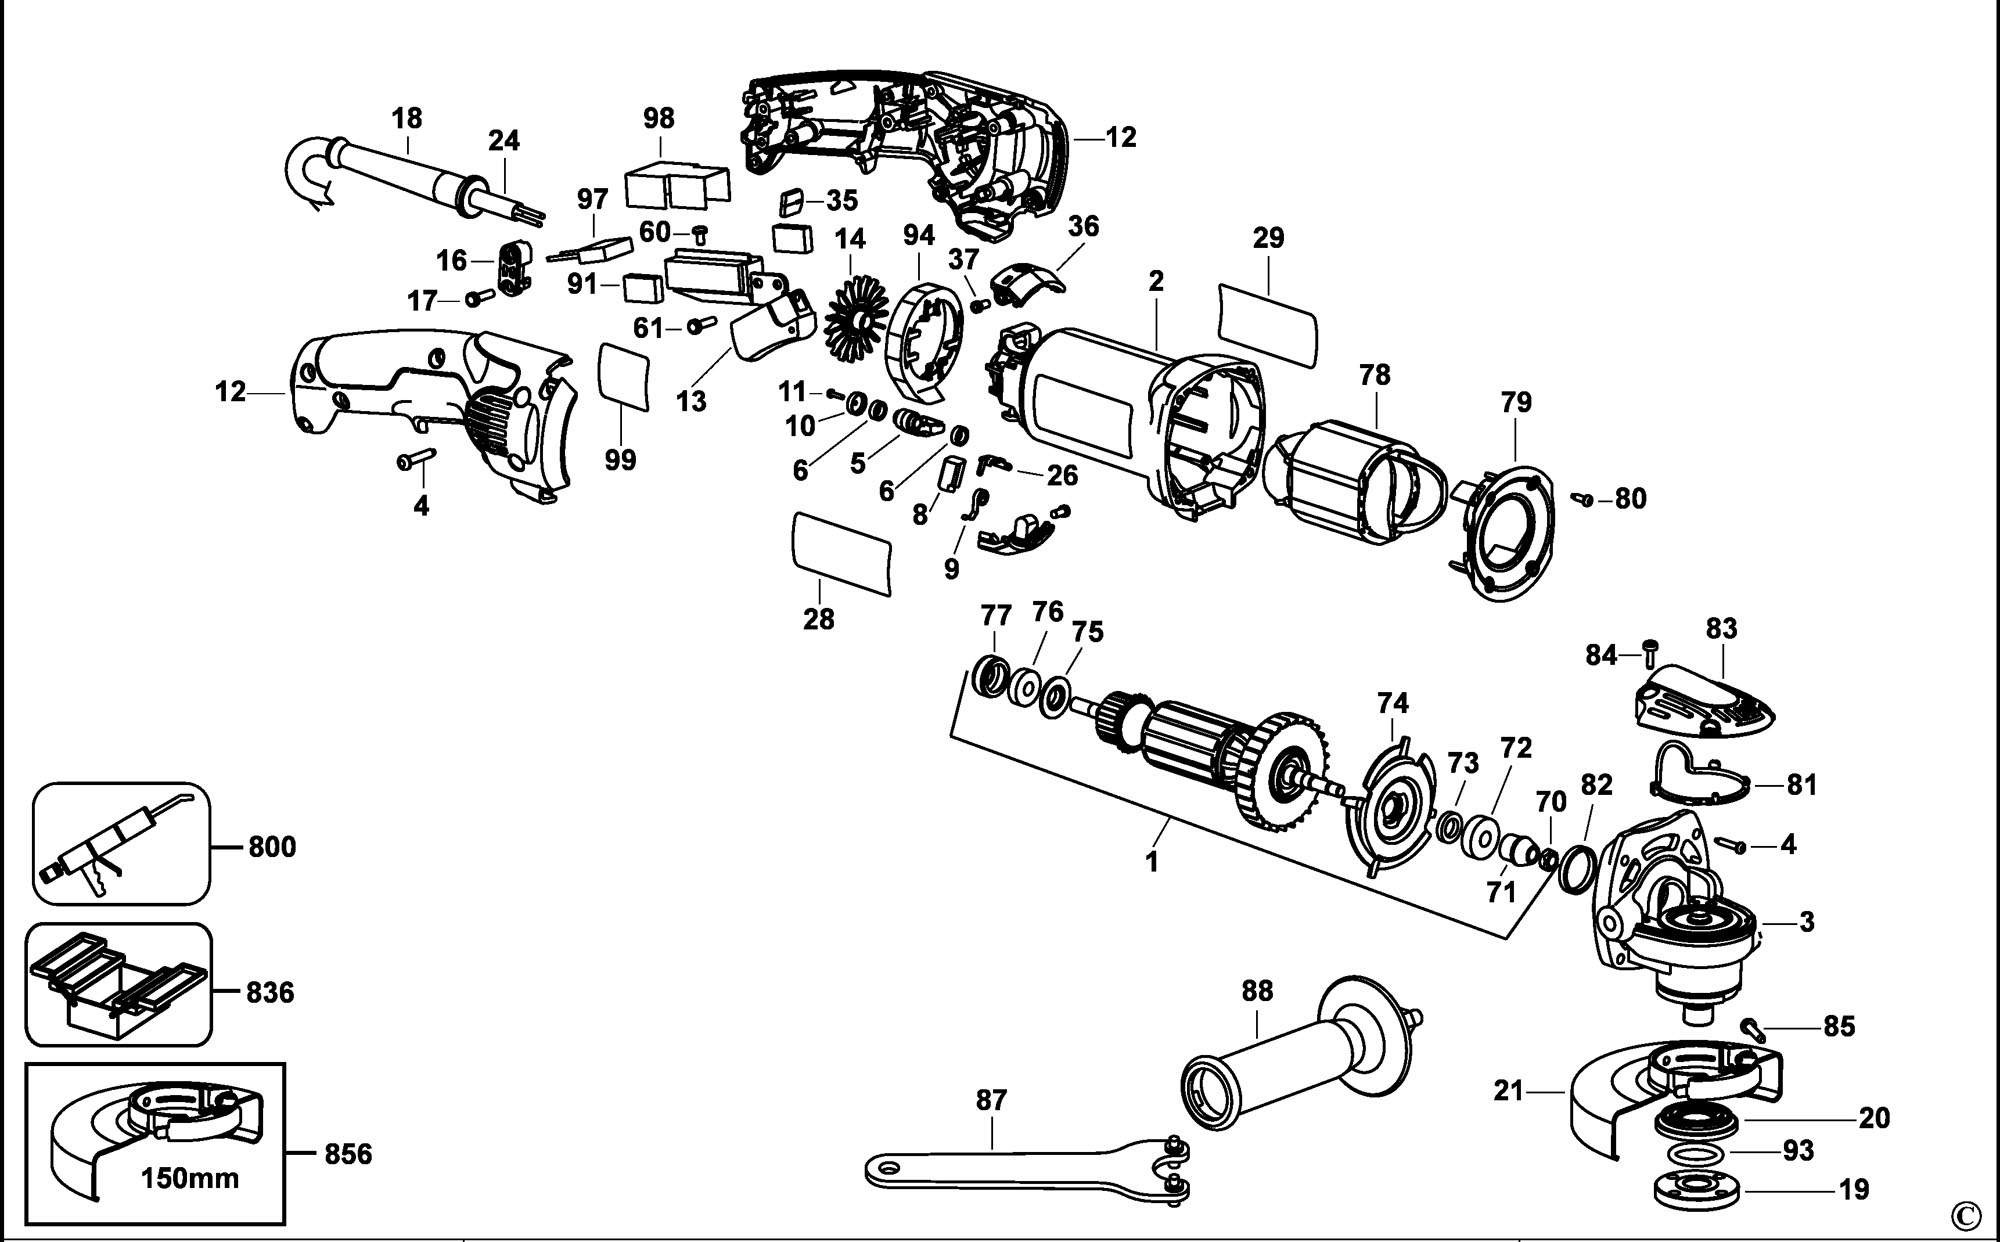 Spares for Dewalt D28065 Small Angle Grinder (type 2